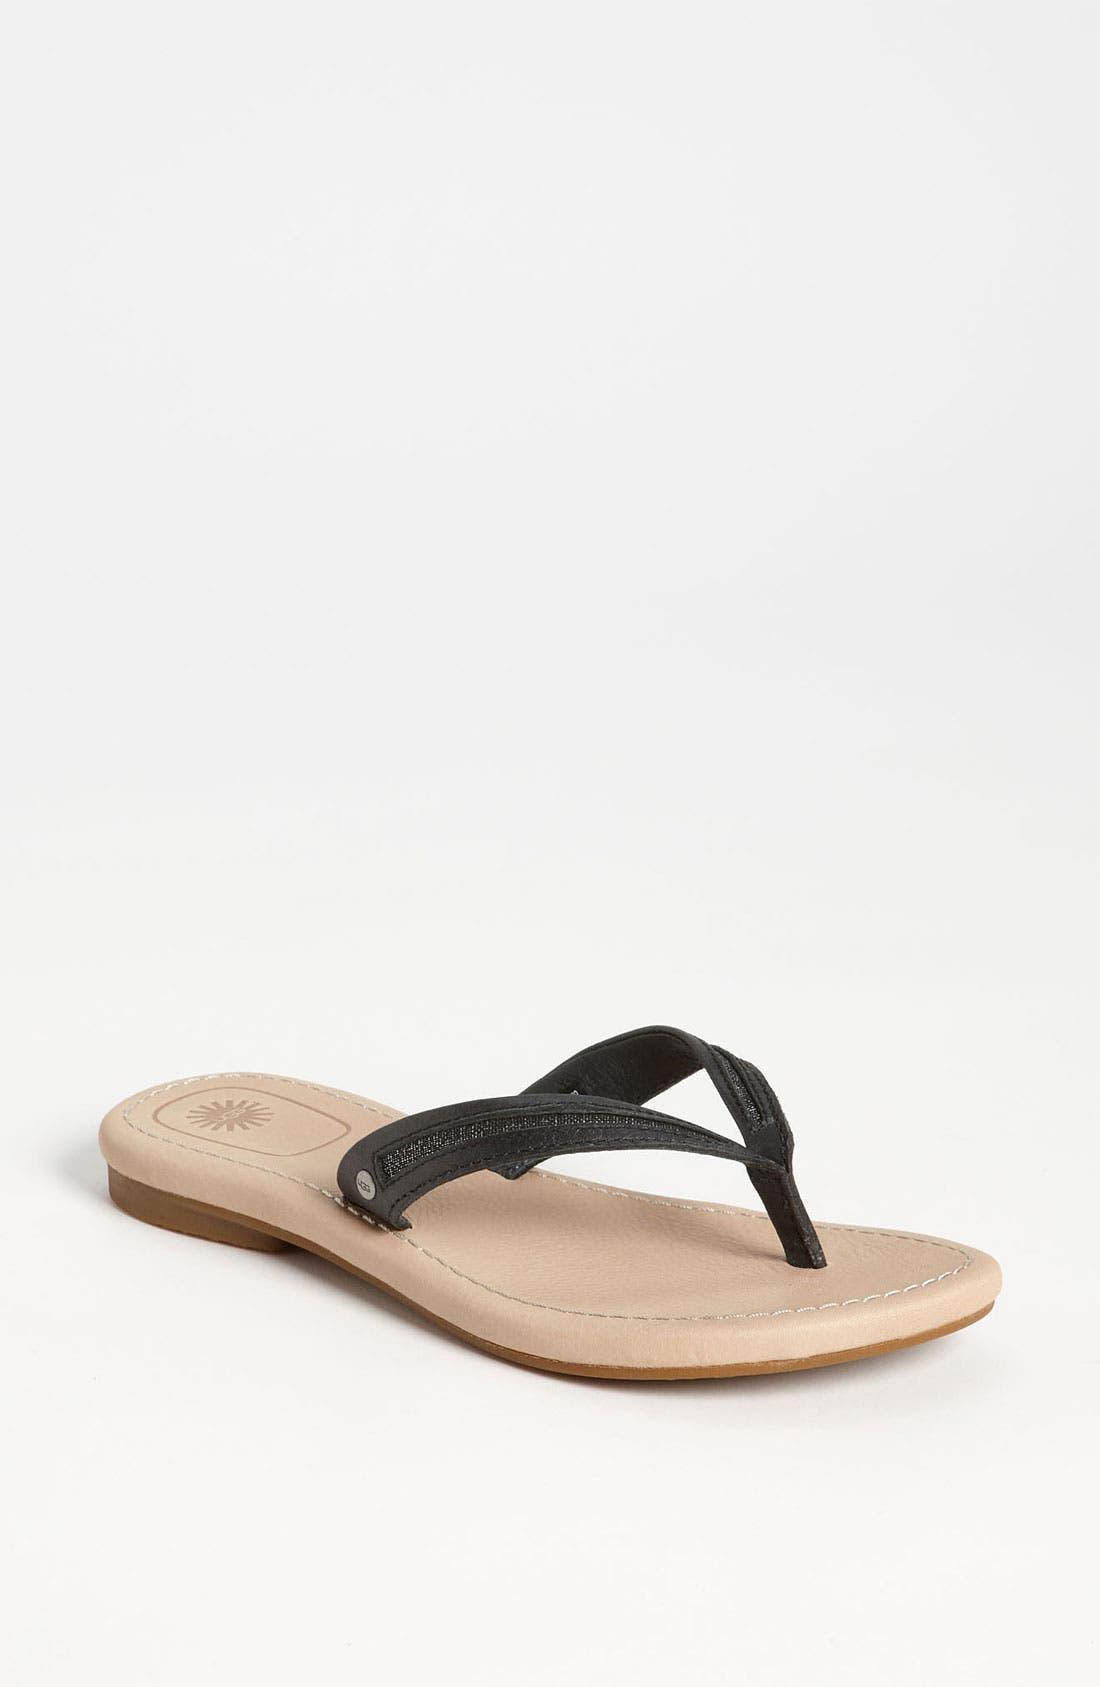 Alternate Image 1 Selected - UGG® Australia 'Elyza II' Sandal (Women)